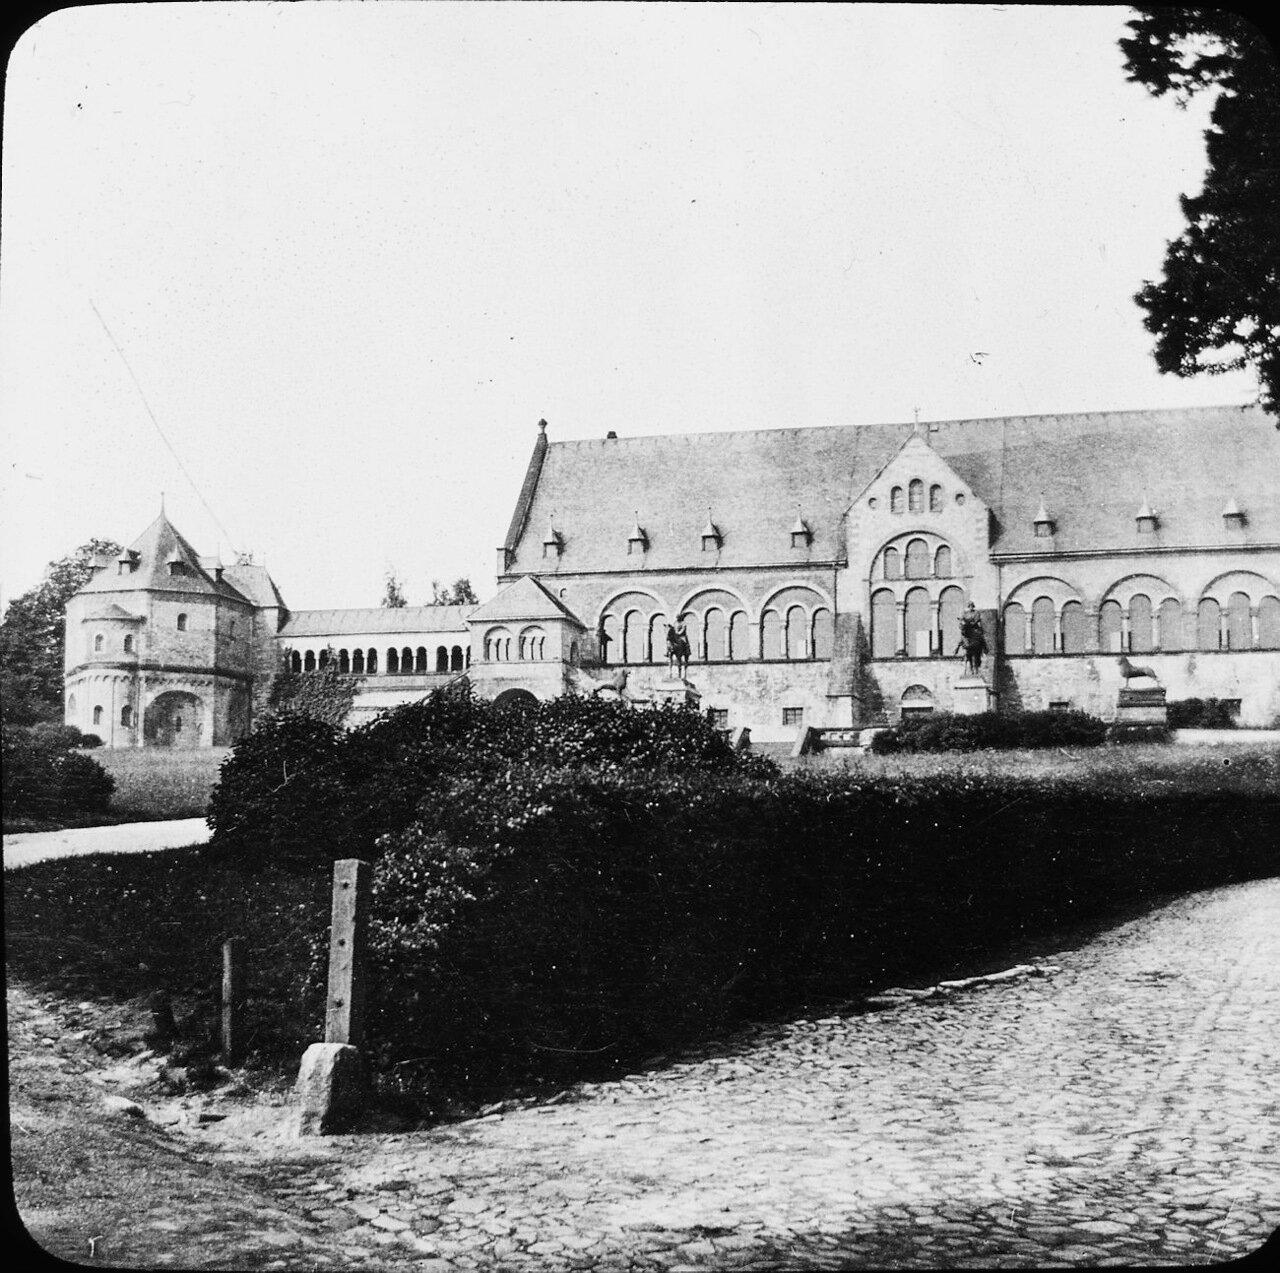 Гослар. Королевский дворец на Кайзерплац, 1907